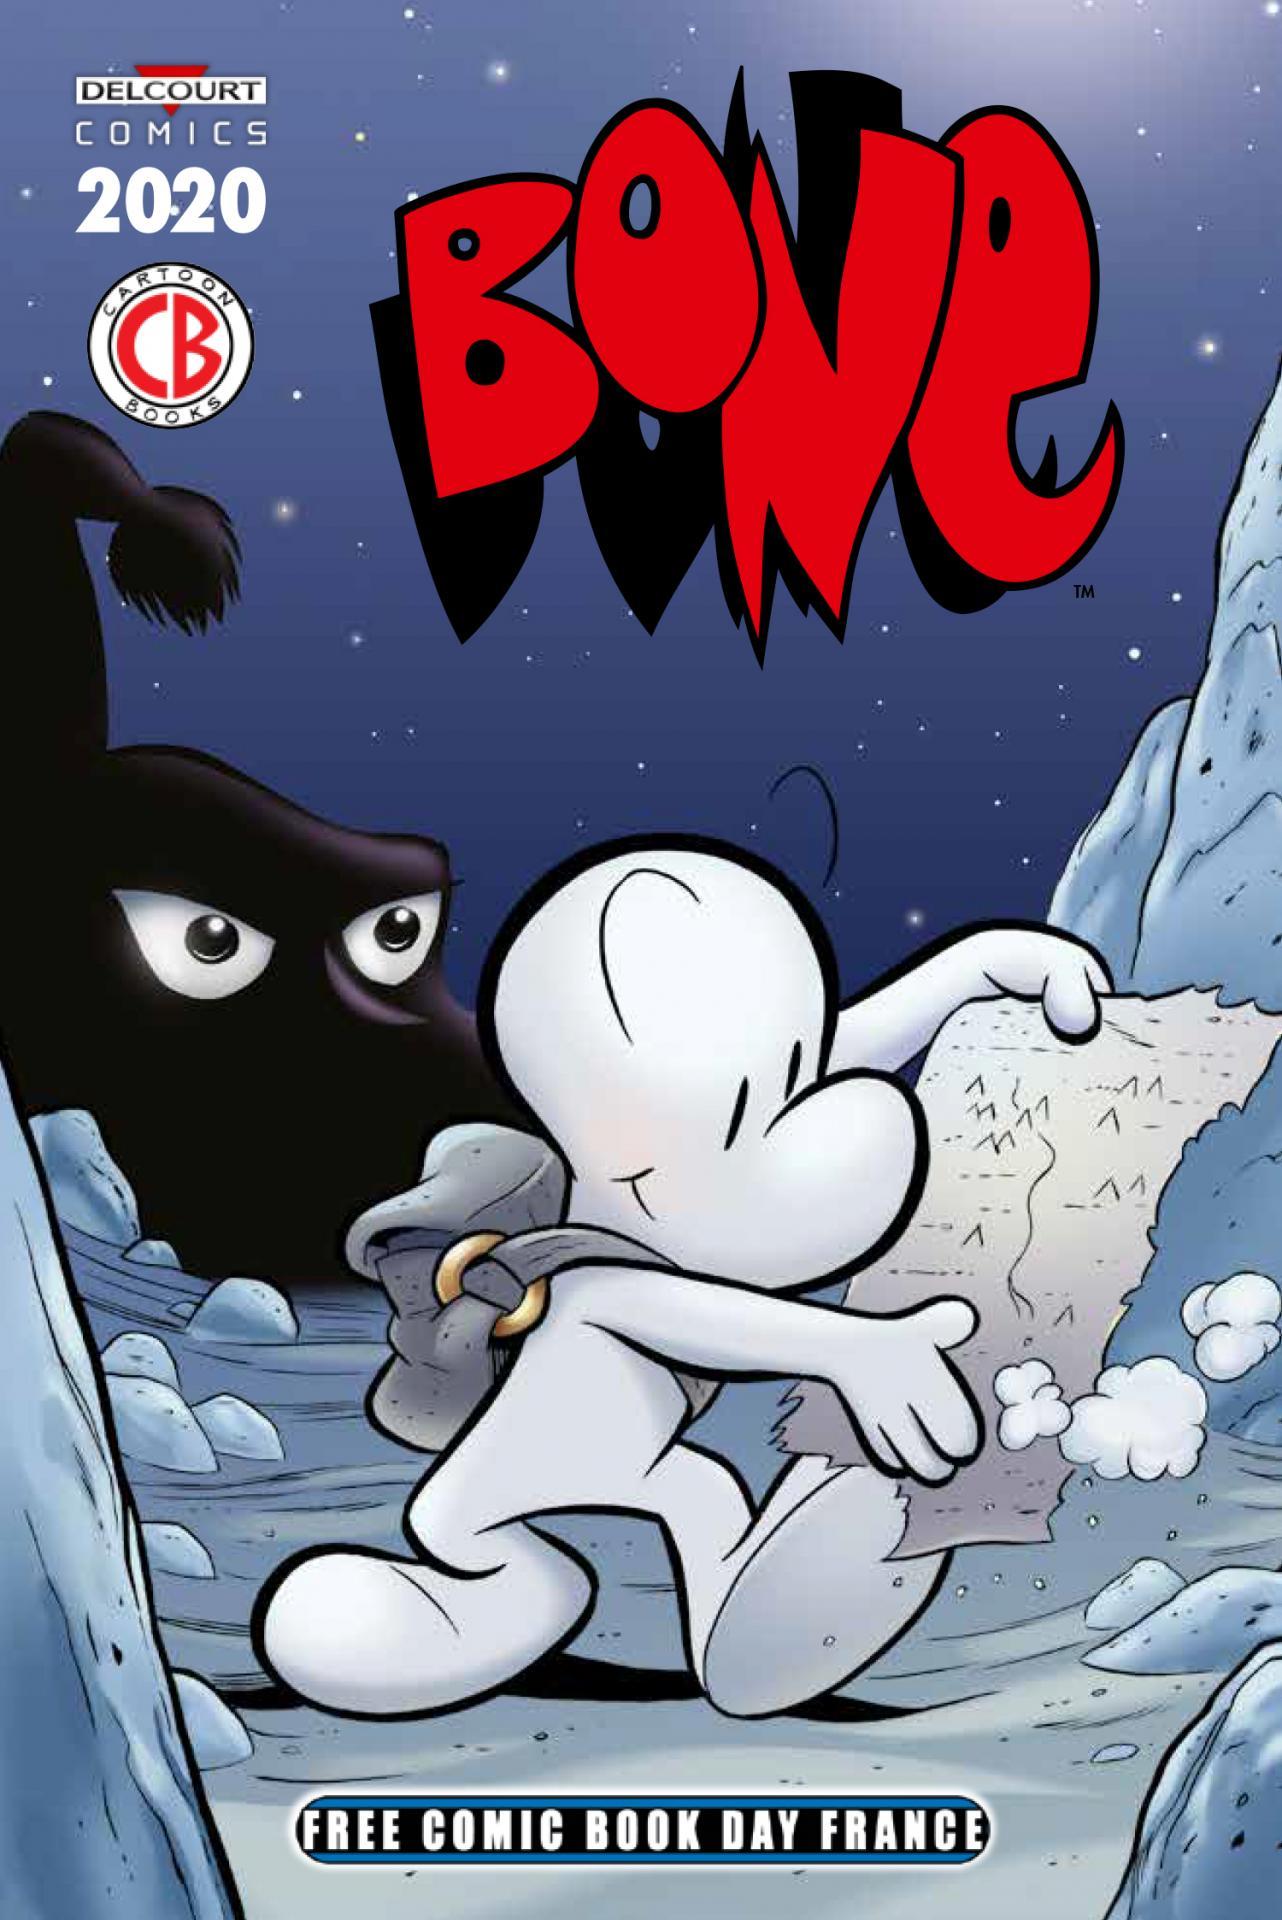 Delcourt free comic book day france 2020 bone